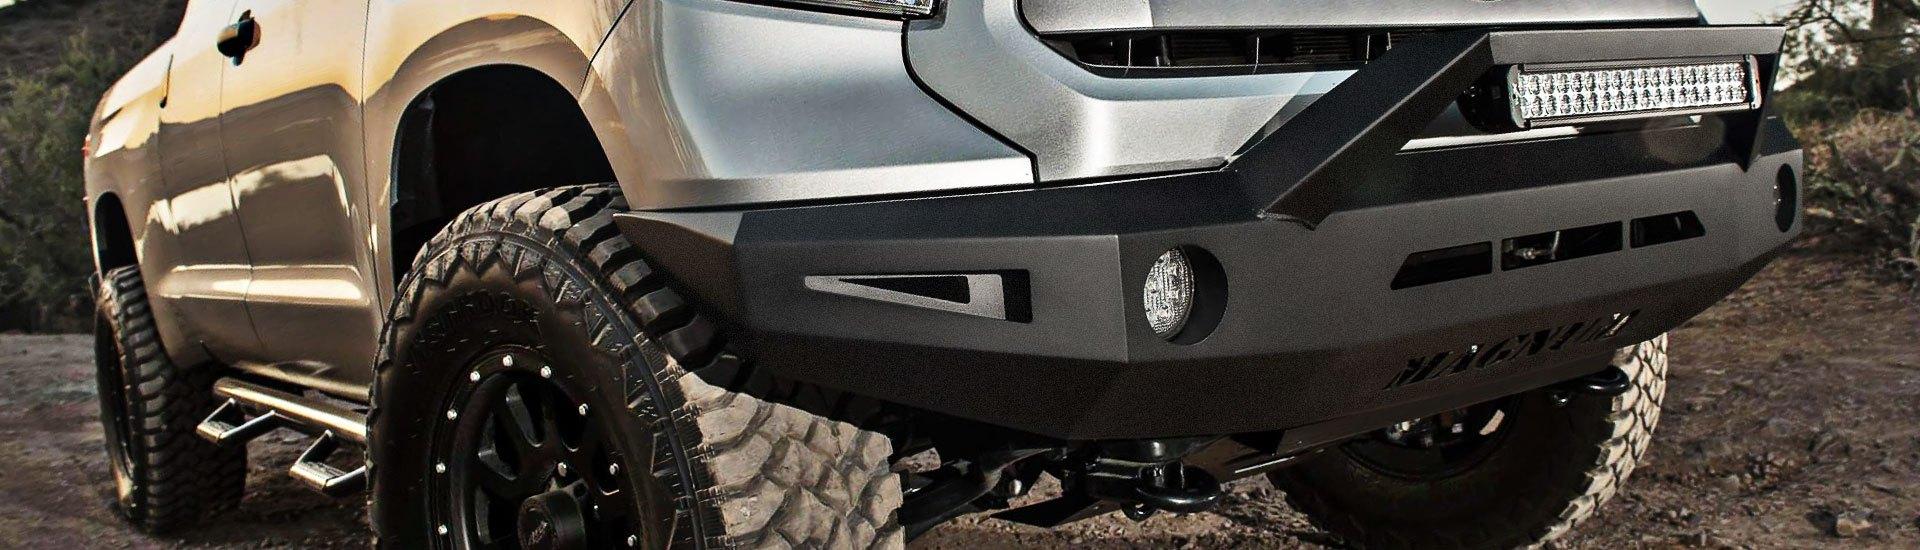 Custom 4x4 Off Road Steel Bumpers For Trucks Jeeps And Suvs Bumper Guard Honda Minivan 4 11